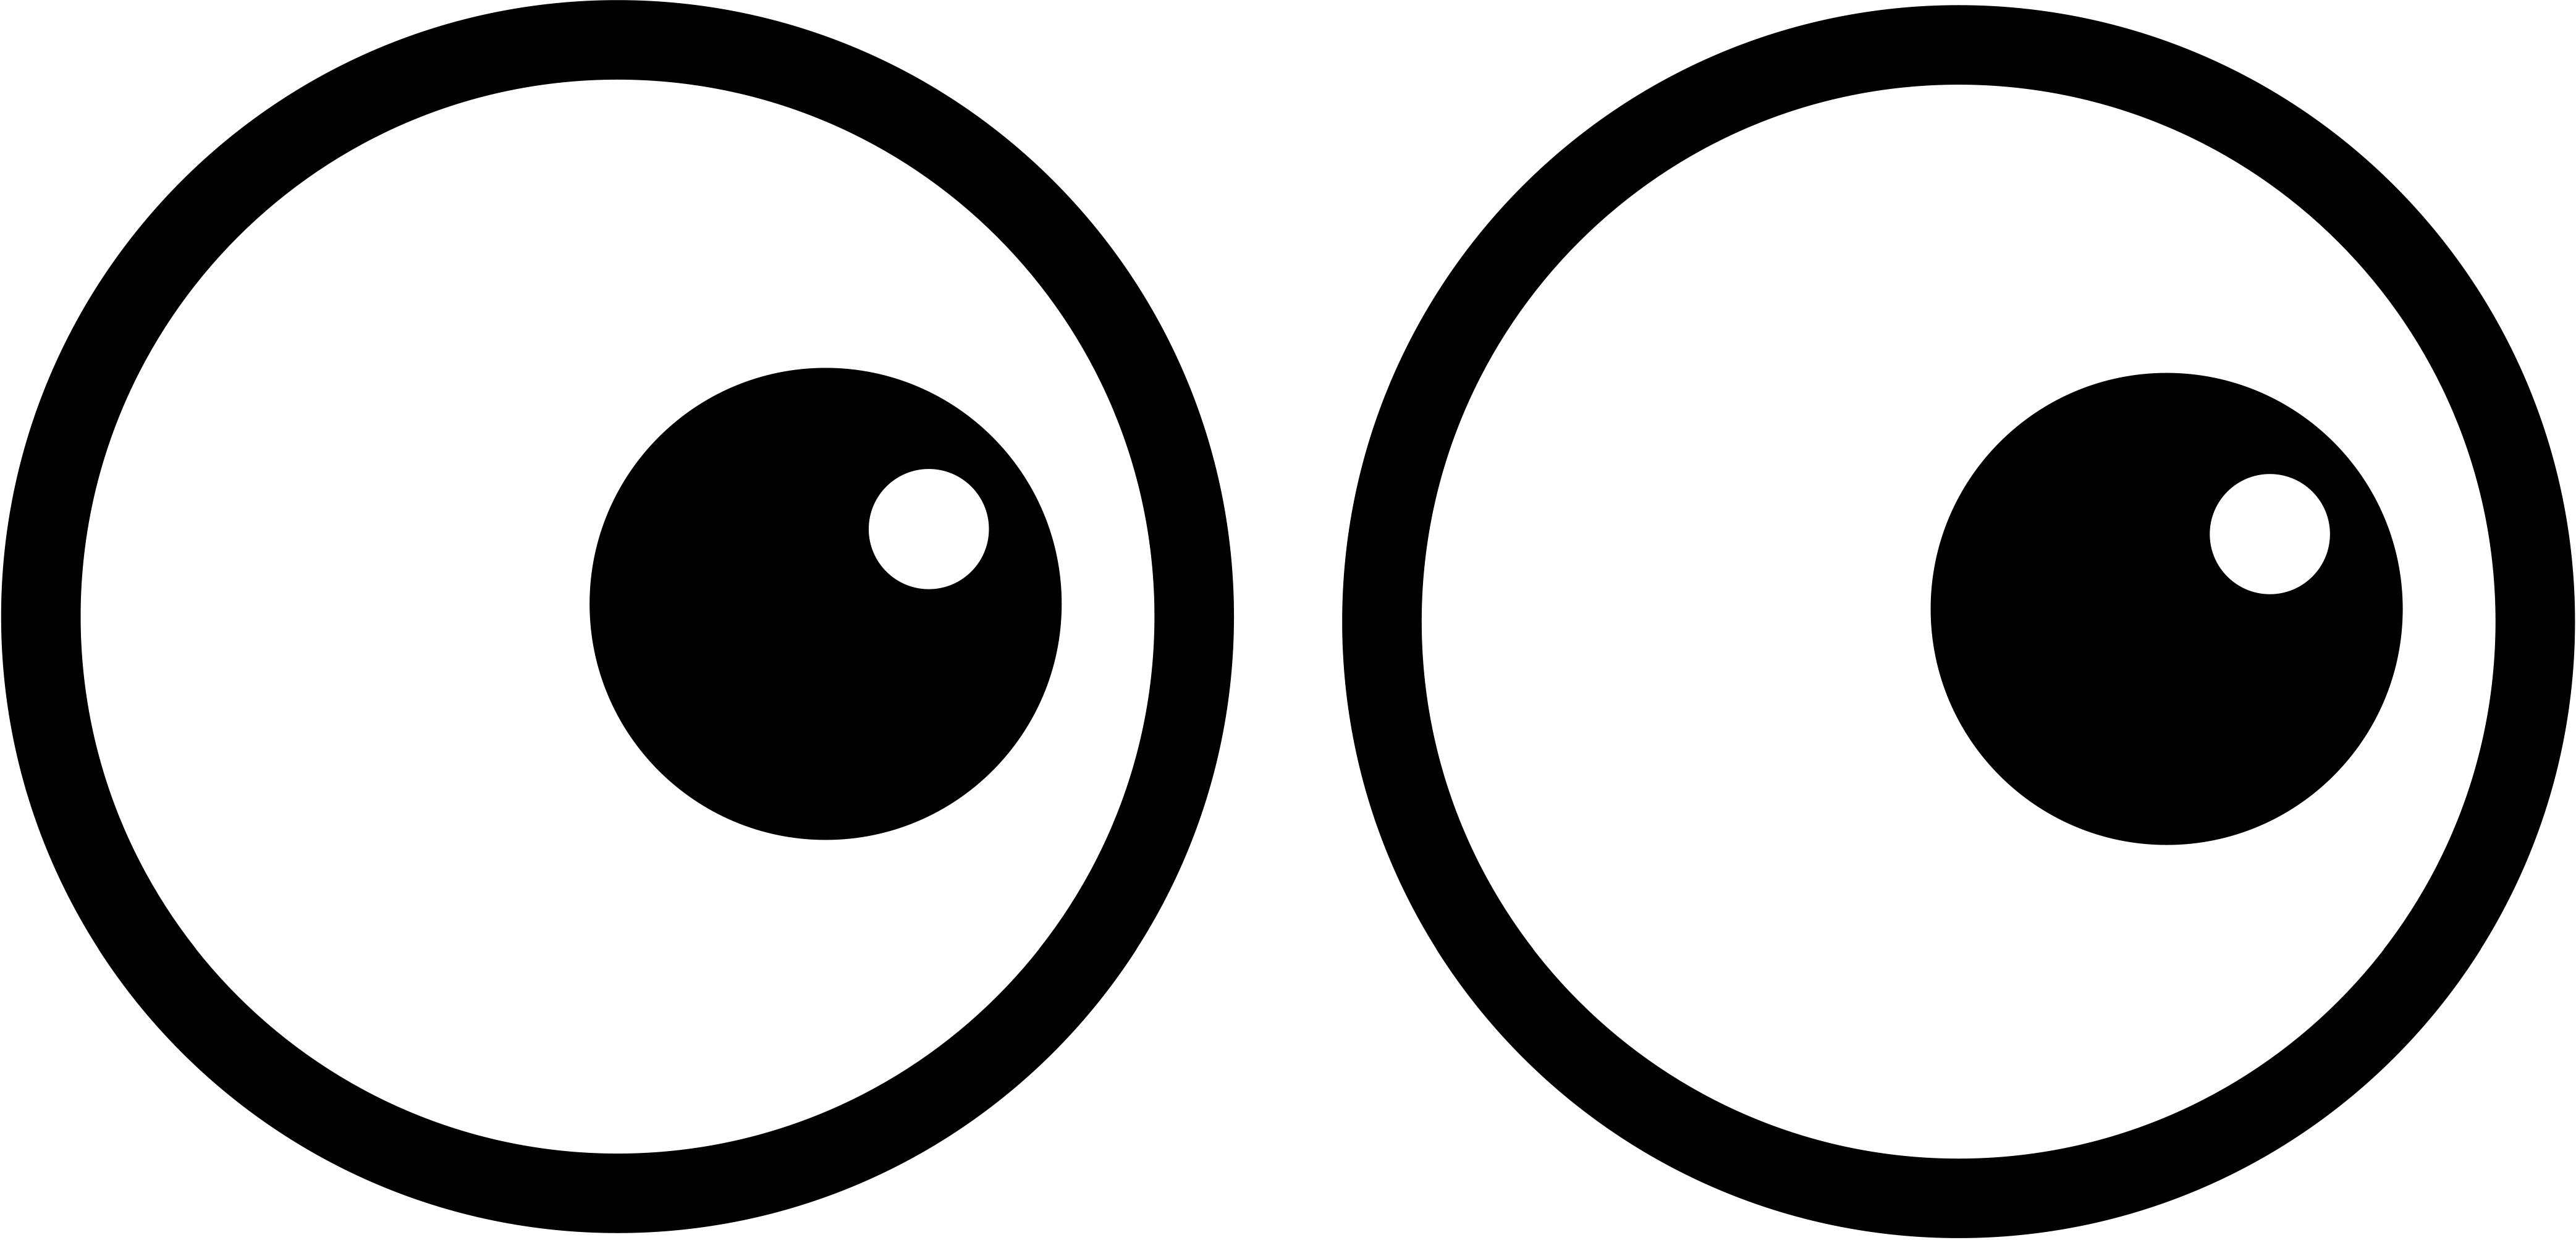 4169x2007 Eyeball Black And White Eye Clip Art Black And White Eye Image 2